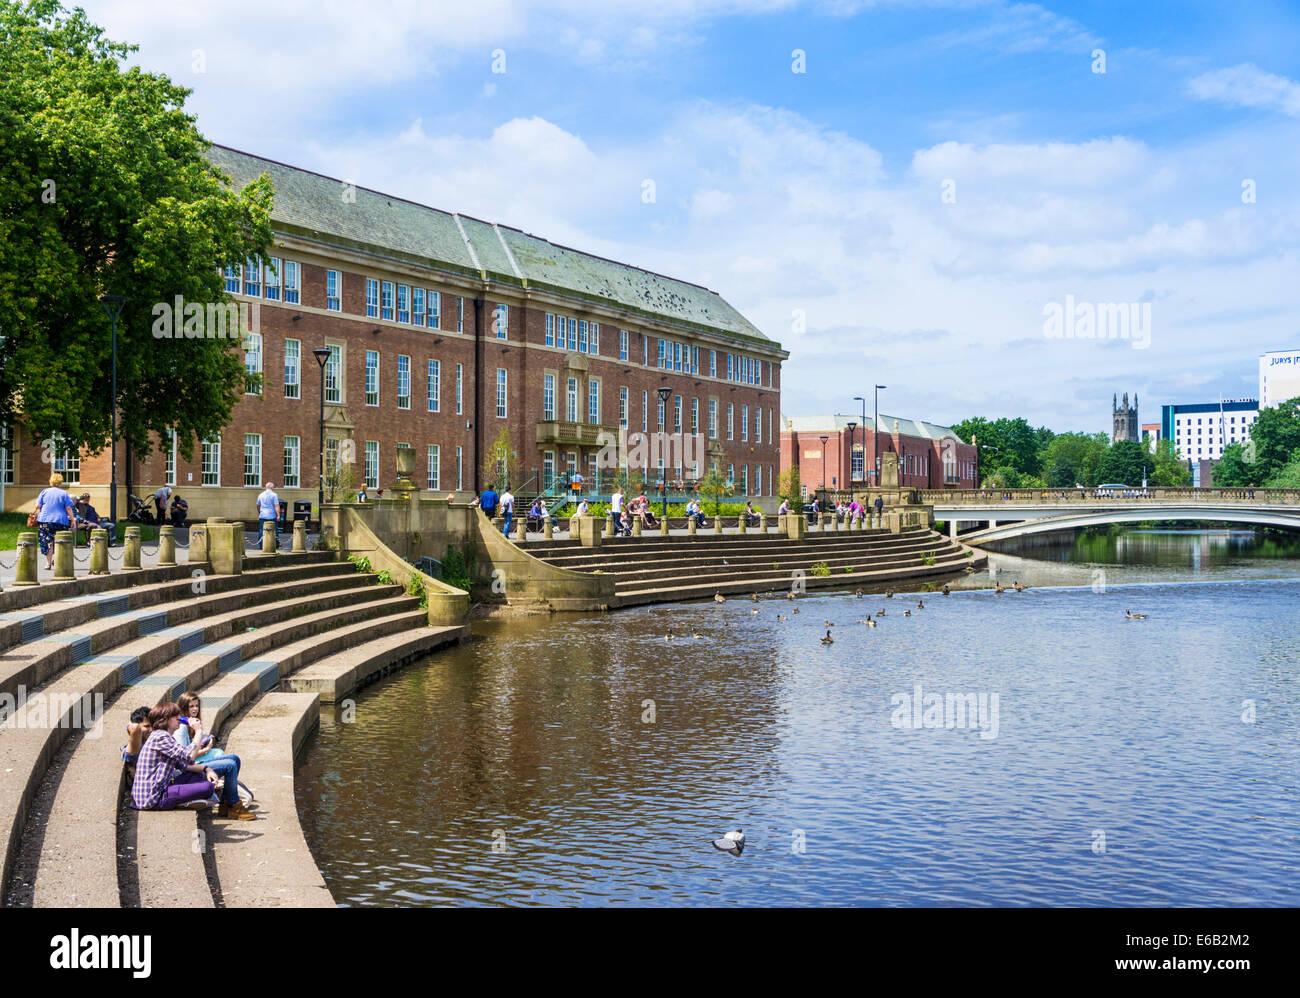 River Derwent and Council House Derby City Centre Derby Derbyshire England UK GB EU Europe - Stock Image